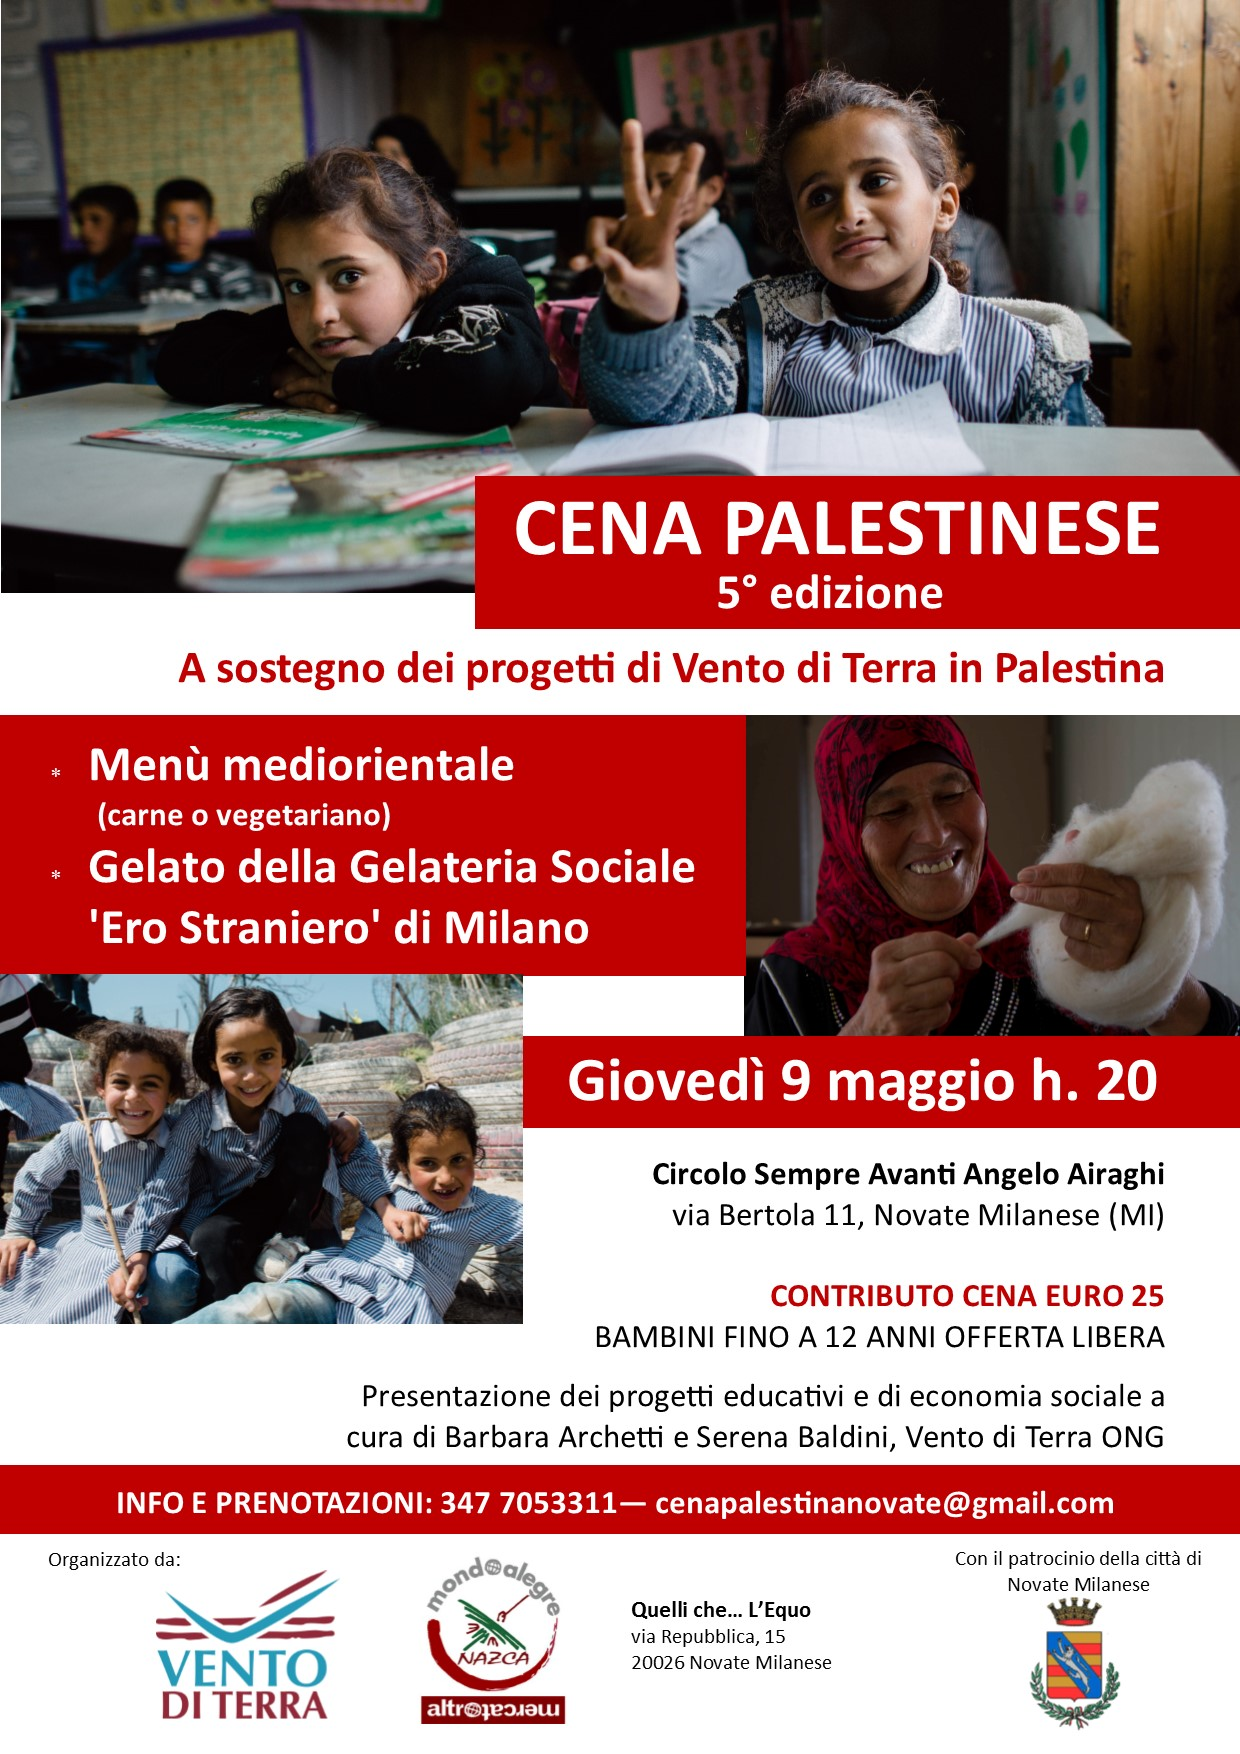 Via Bertola Novate Milanese Mi.Cena Palestinese Vento Di Terra Ong